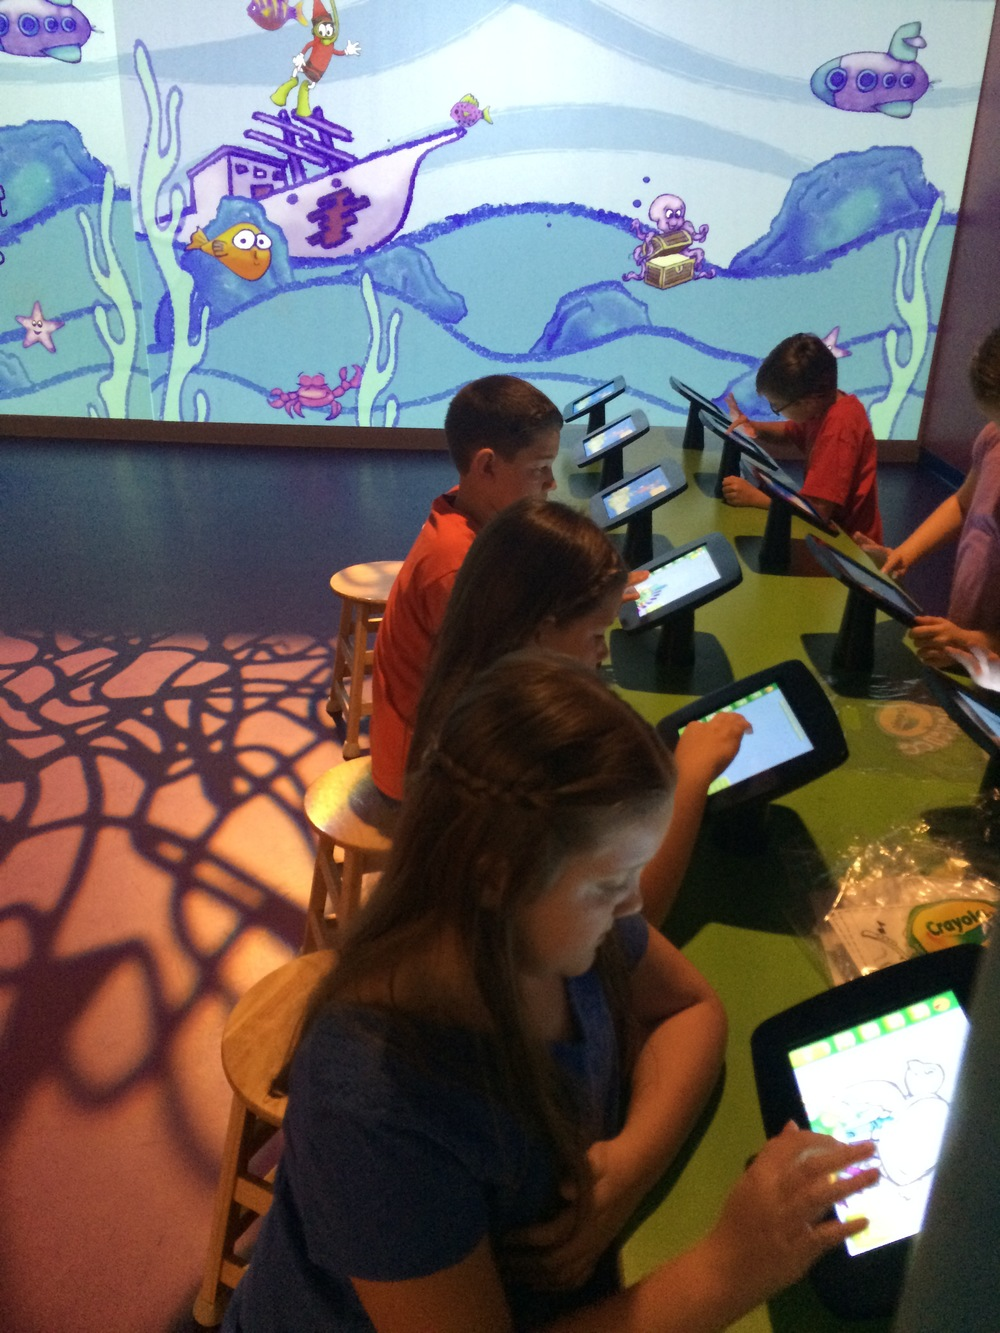 Crayola Experience Orlando, FL ART ALIVE Touchscreens